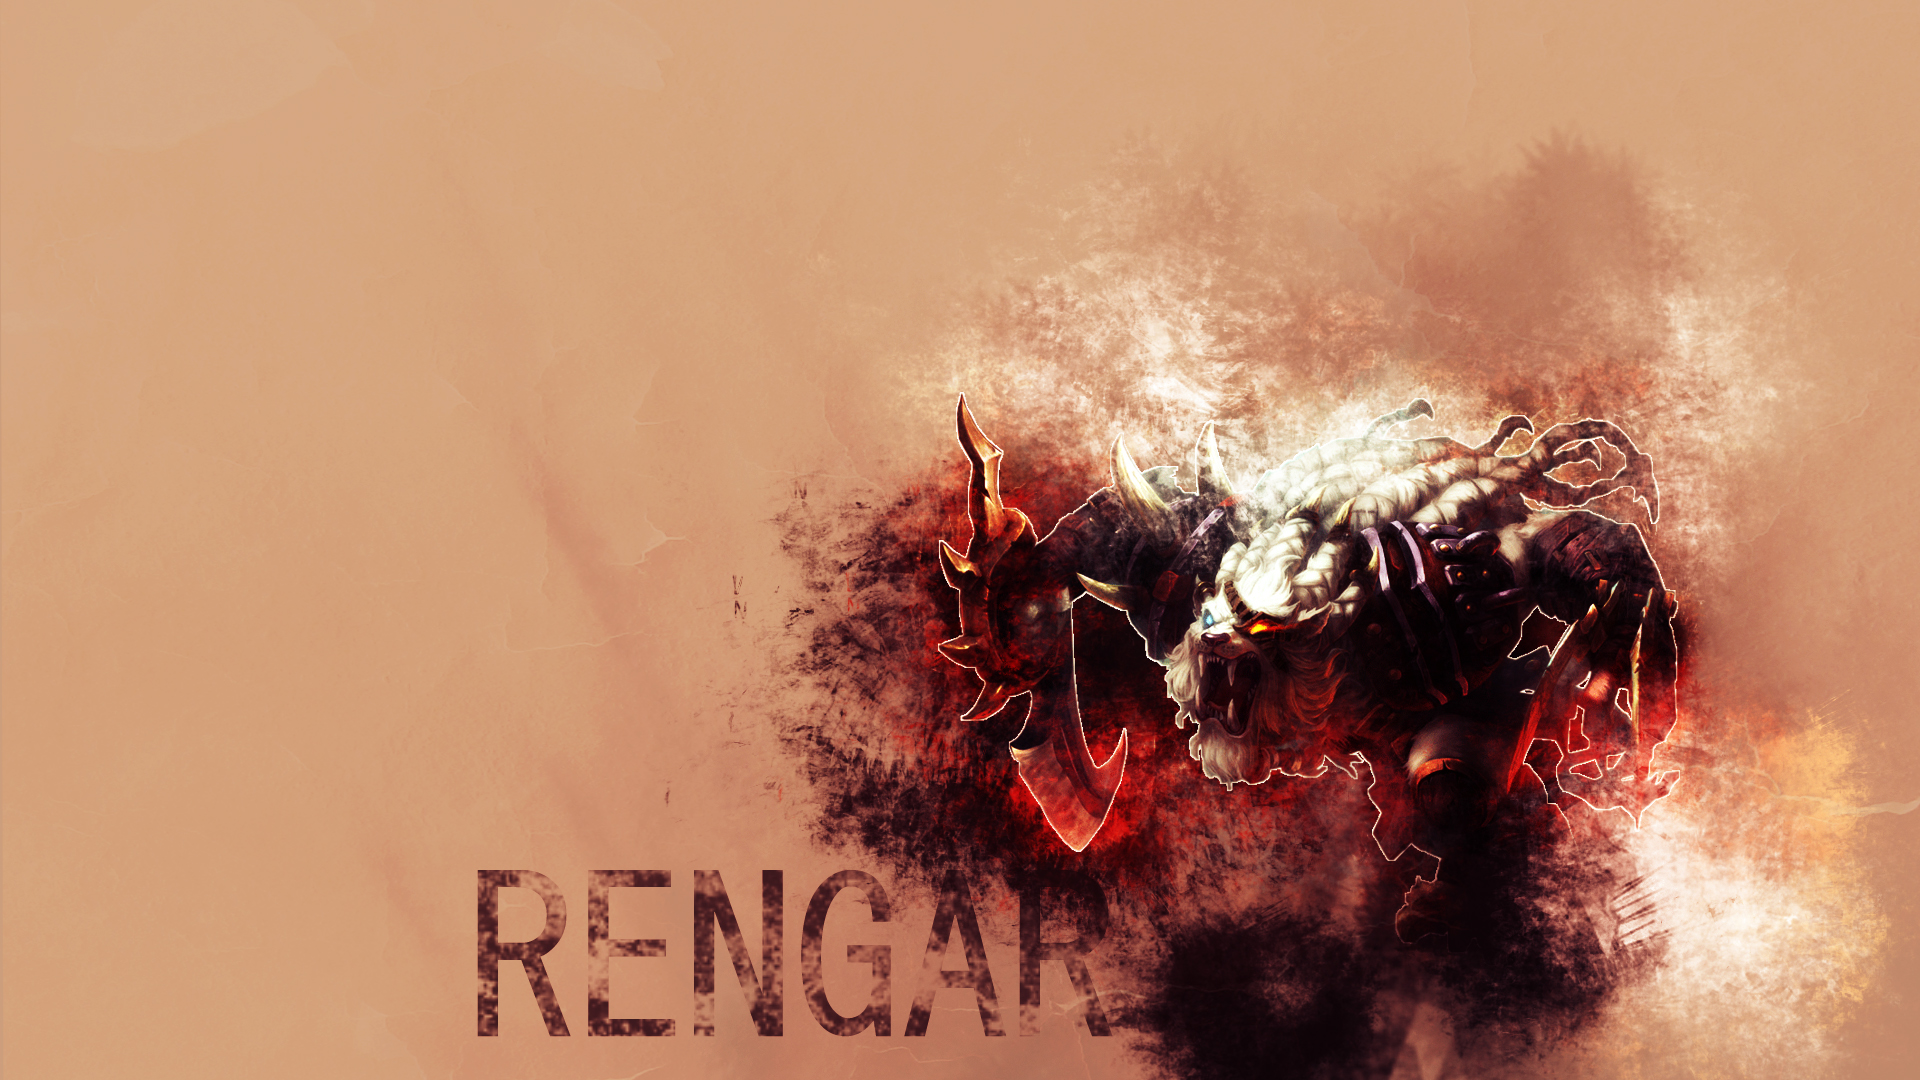 Rengar by xXG0DofCHA0SXx